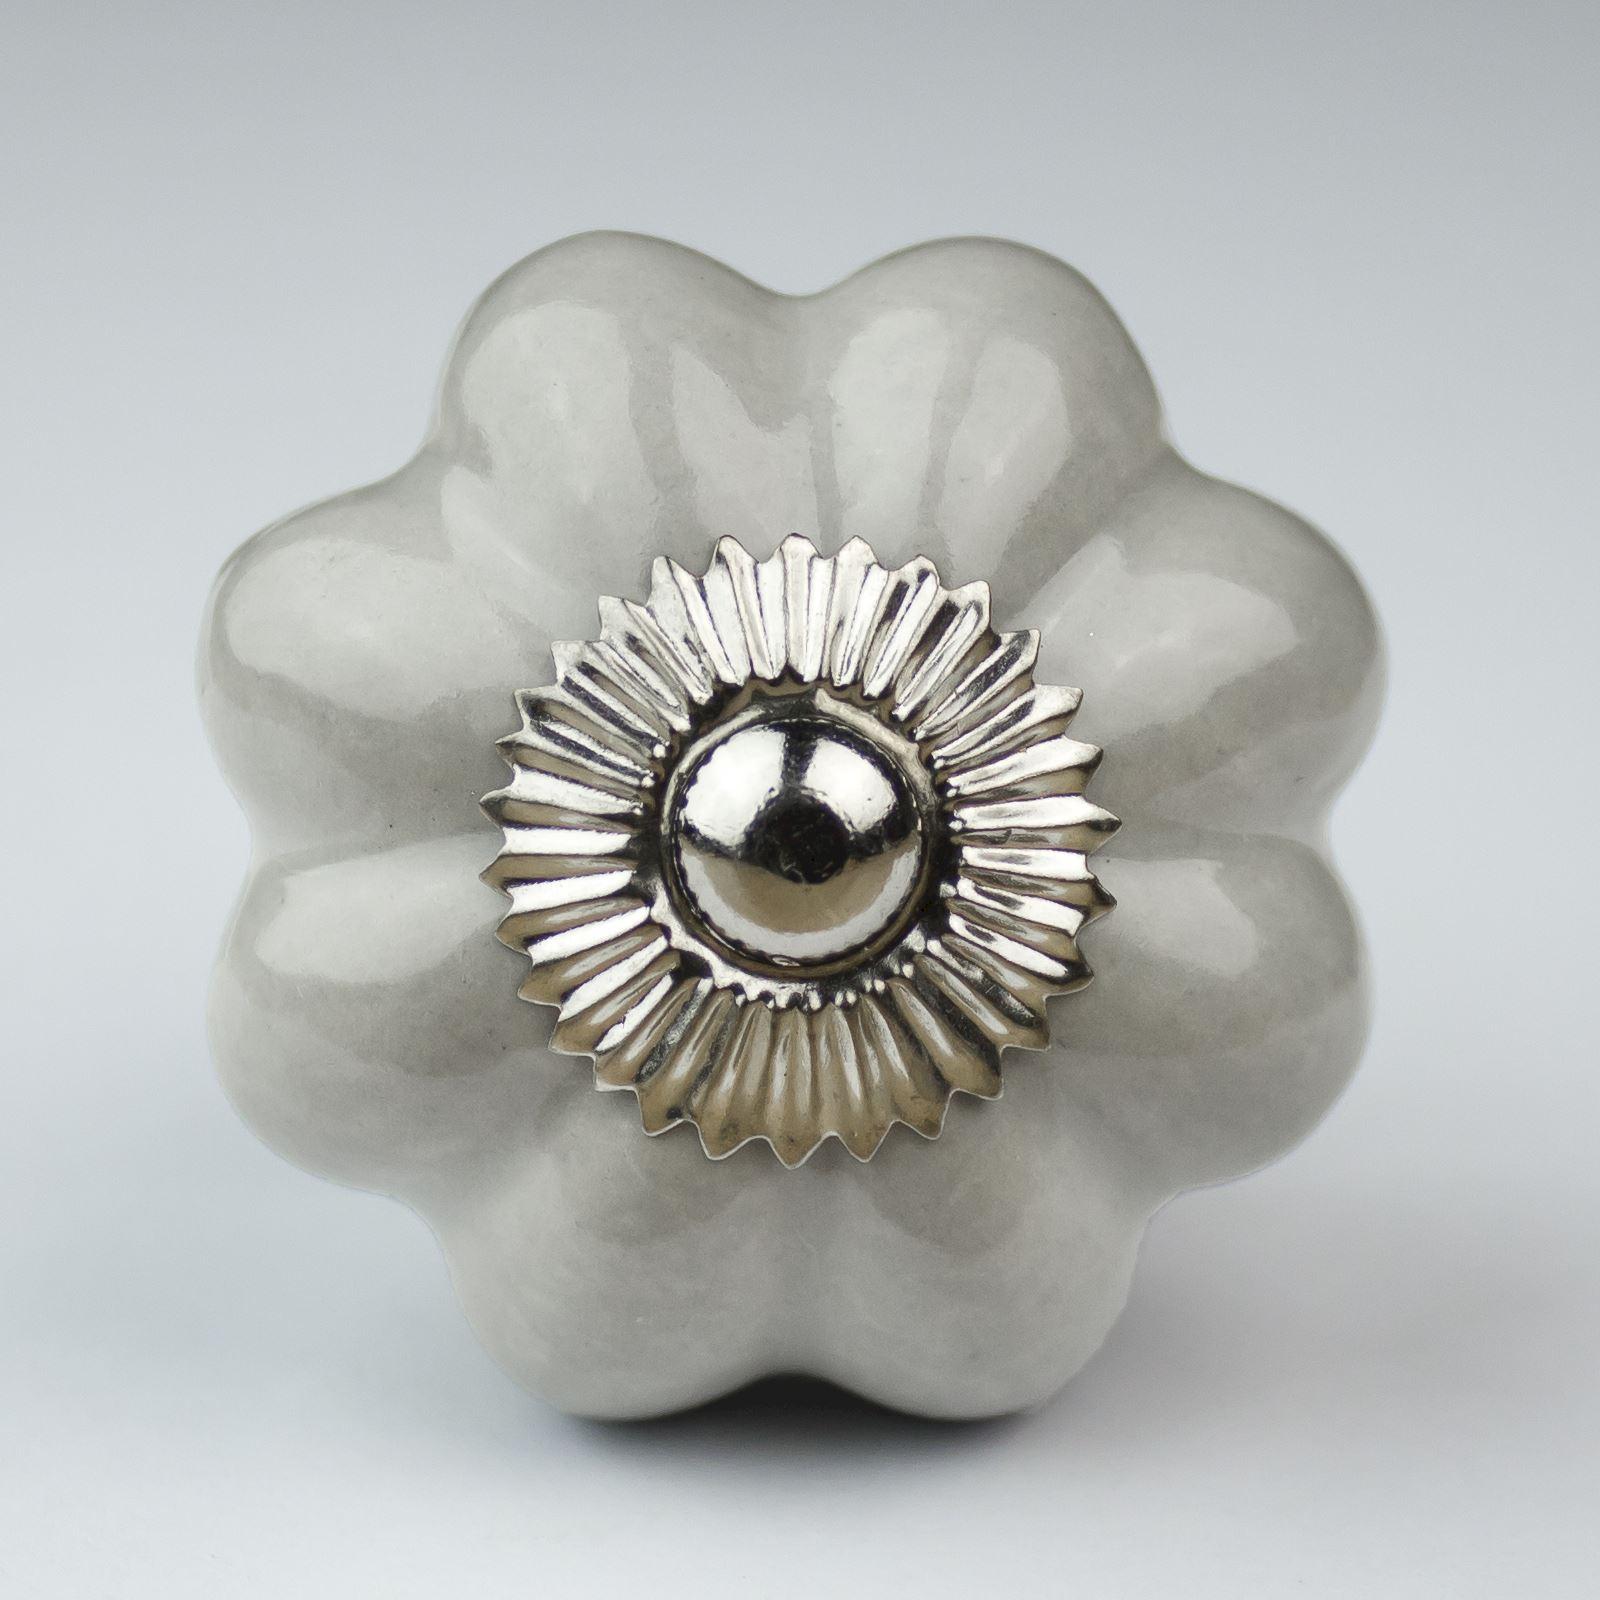 Black White Silver Grey Ceramic Door Knobs Handles